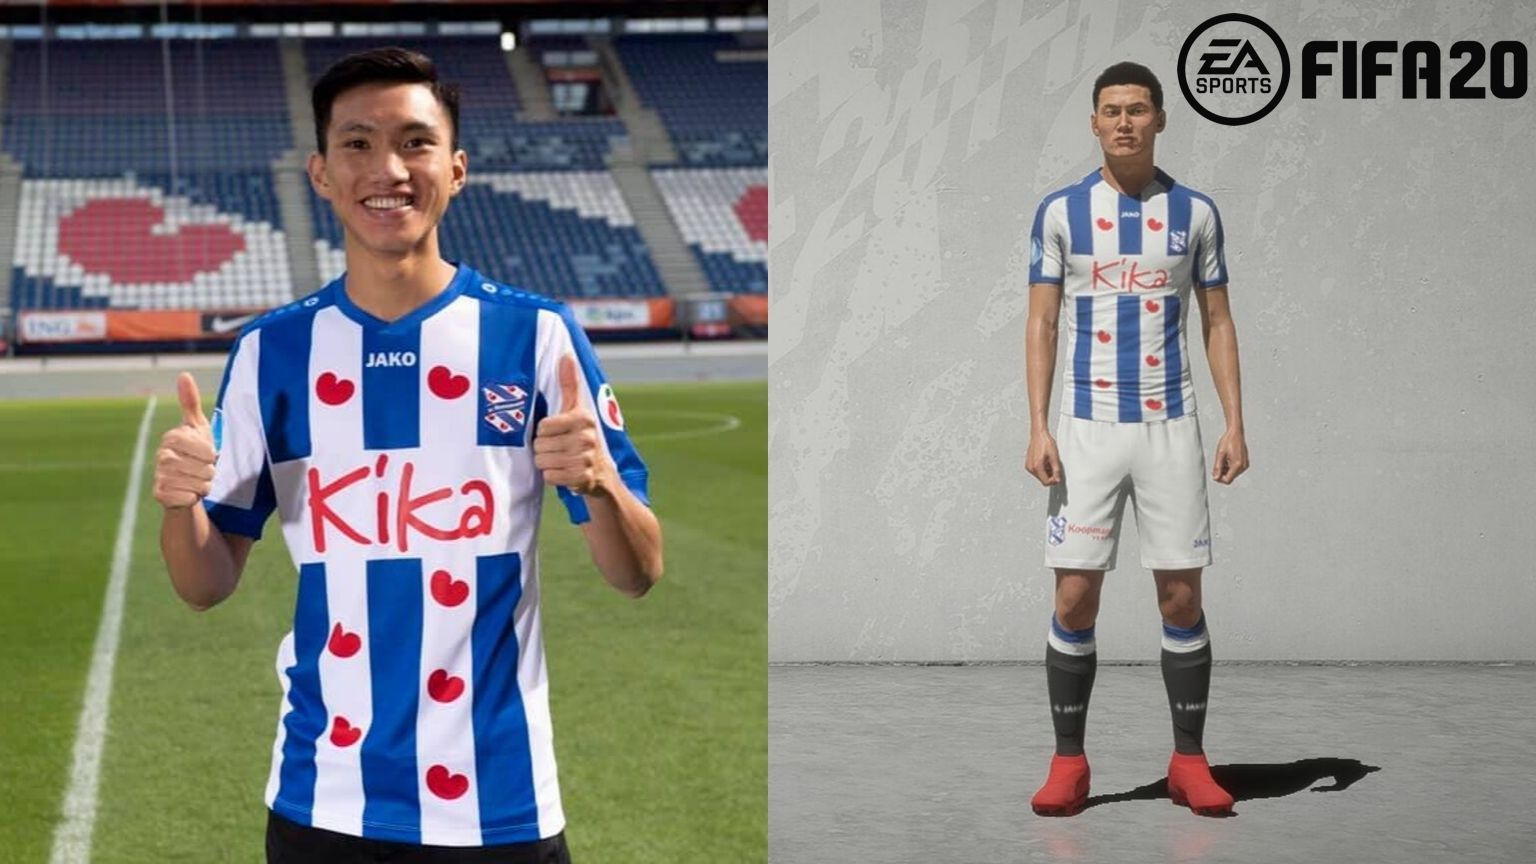 Vietnam football star Doan Van Hau added in FIFA 20 video game